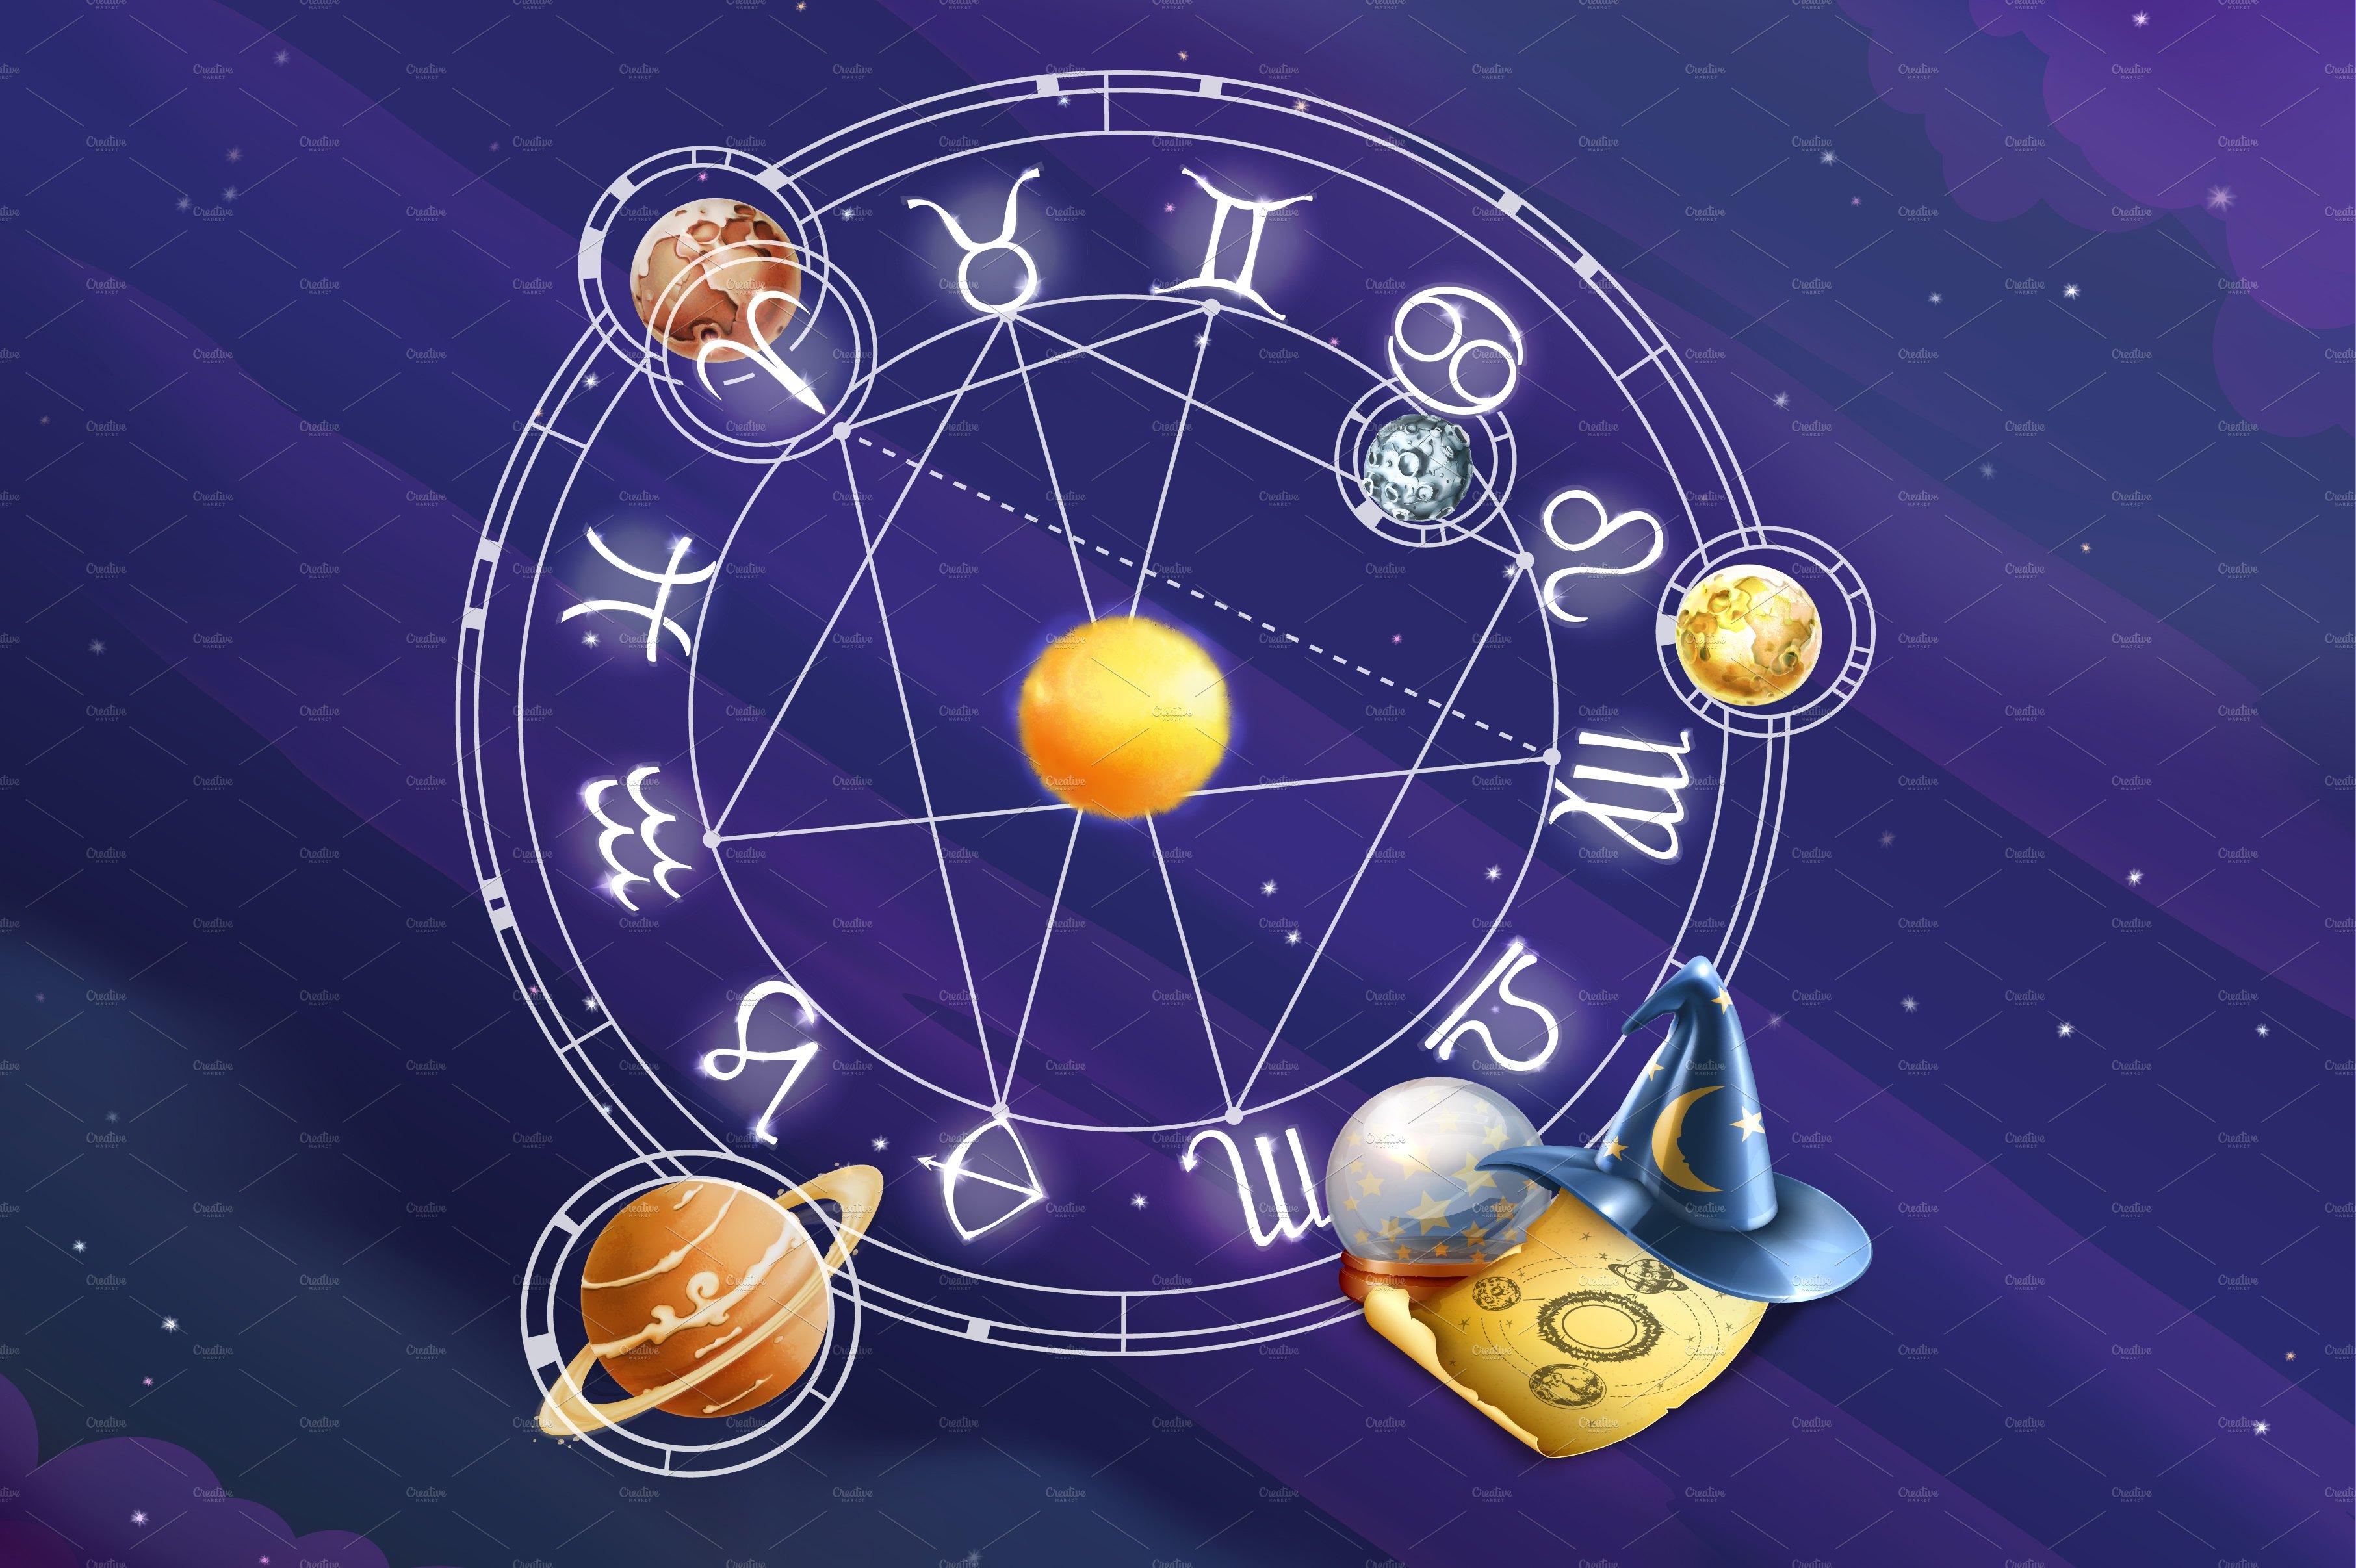 Zodiac signs background ~ Textures ~ Creative Market